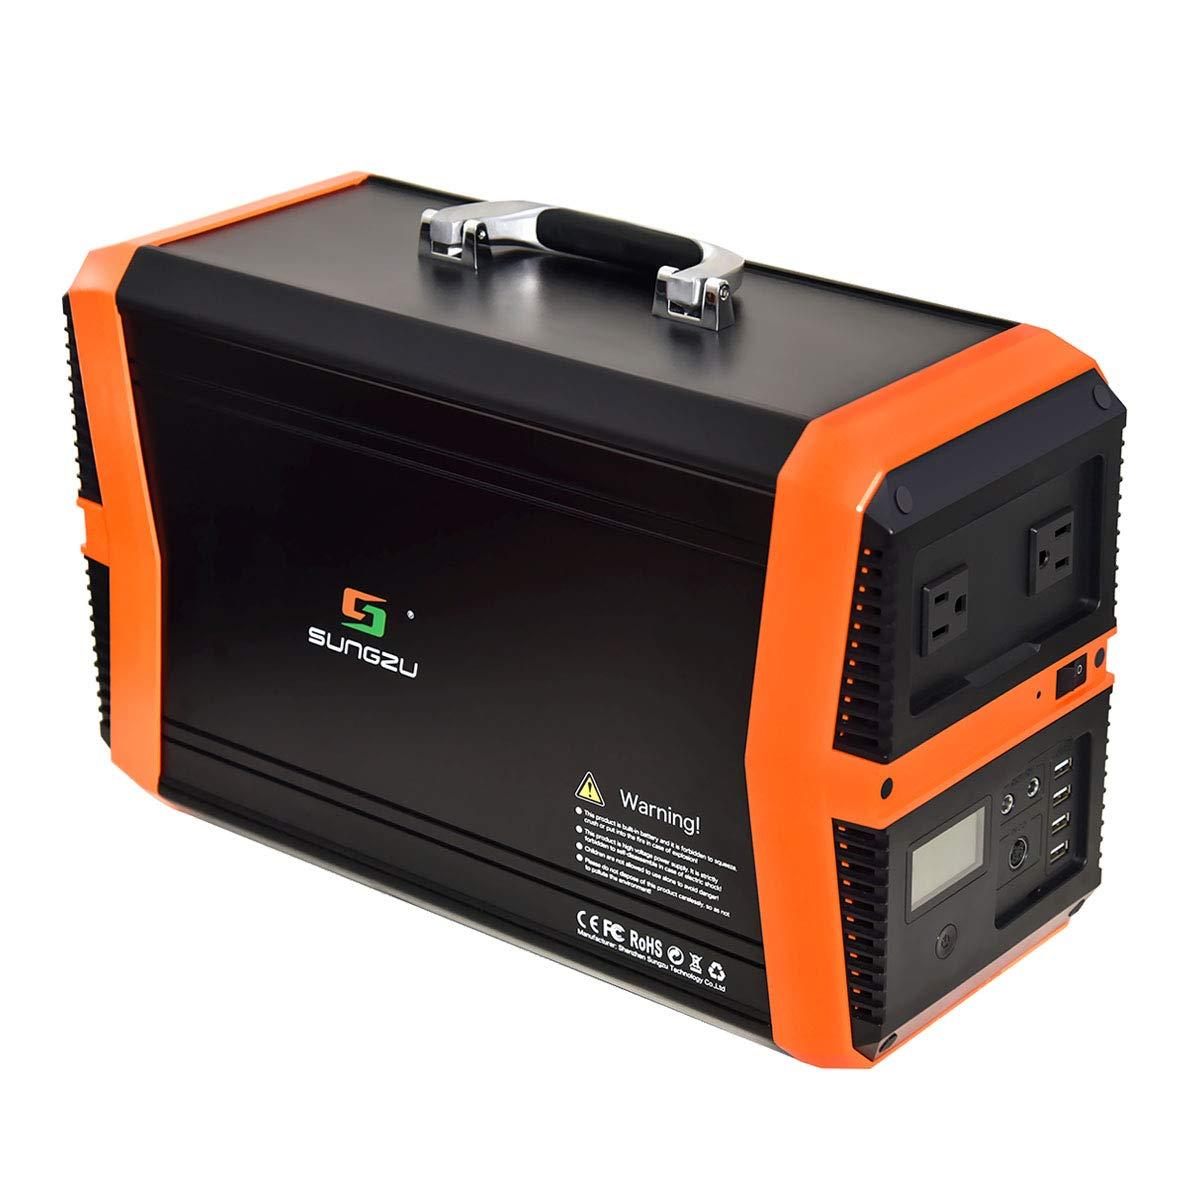 Sungzu Portable Generator Inverter Emergency